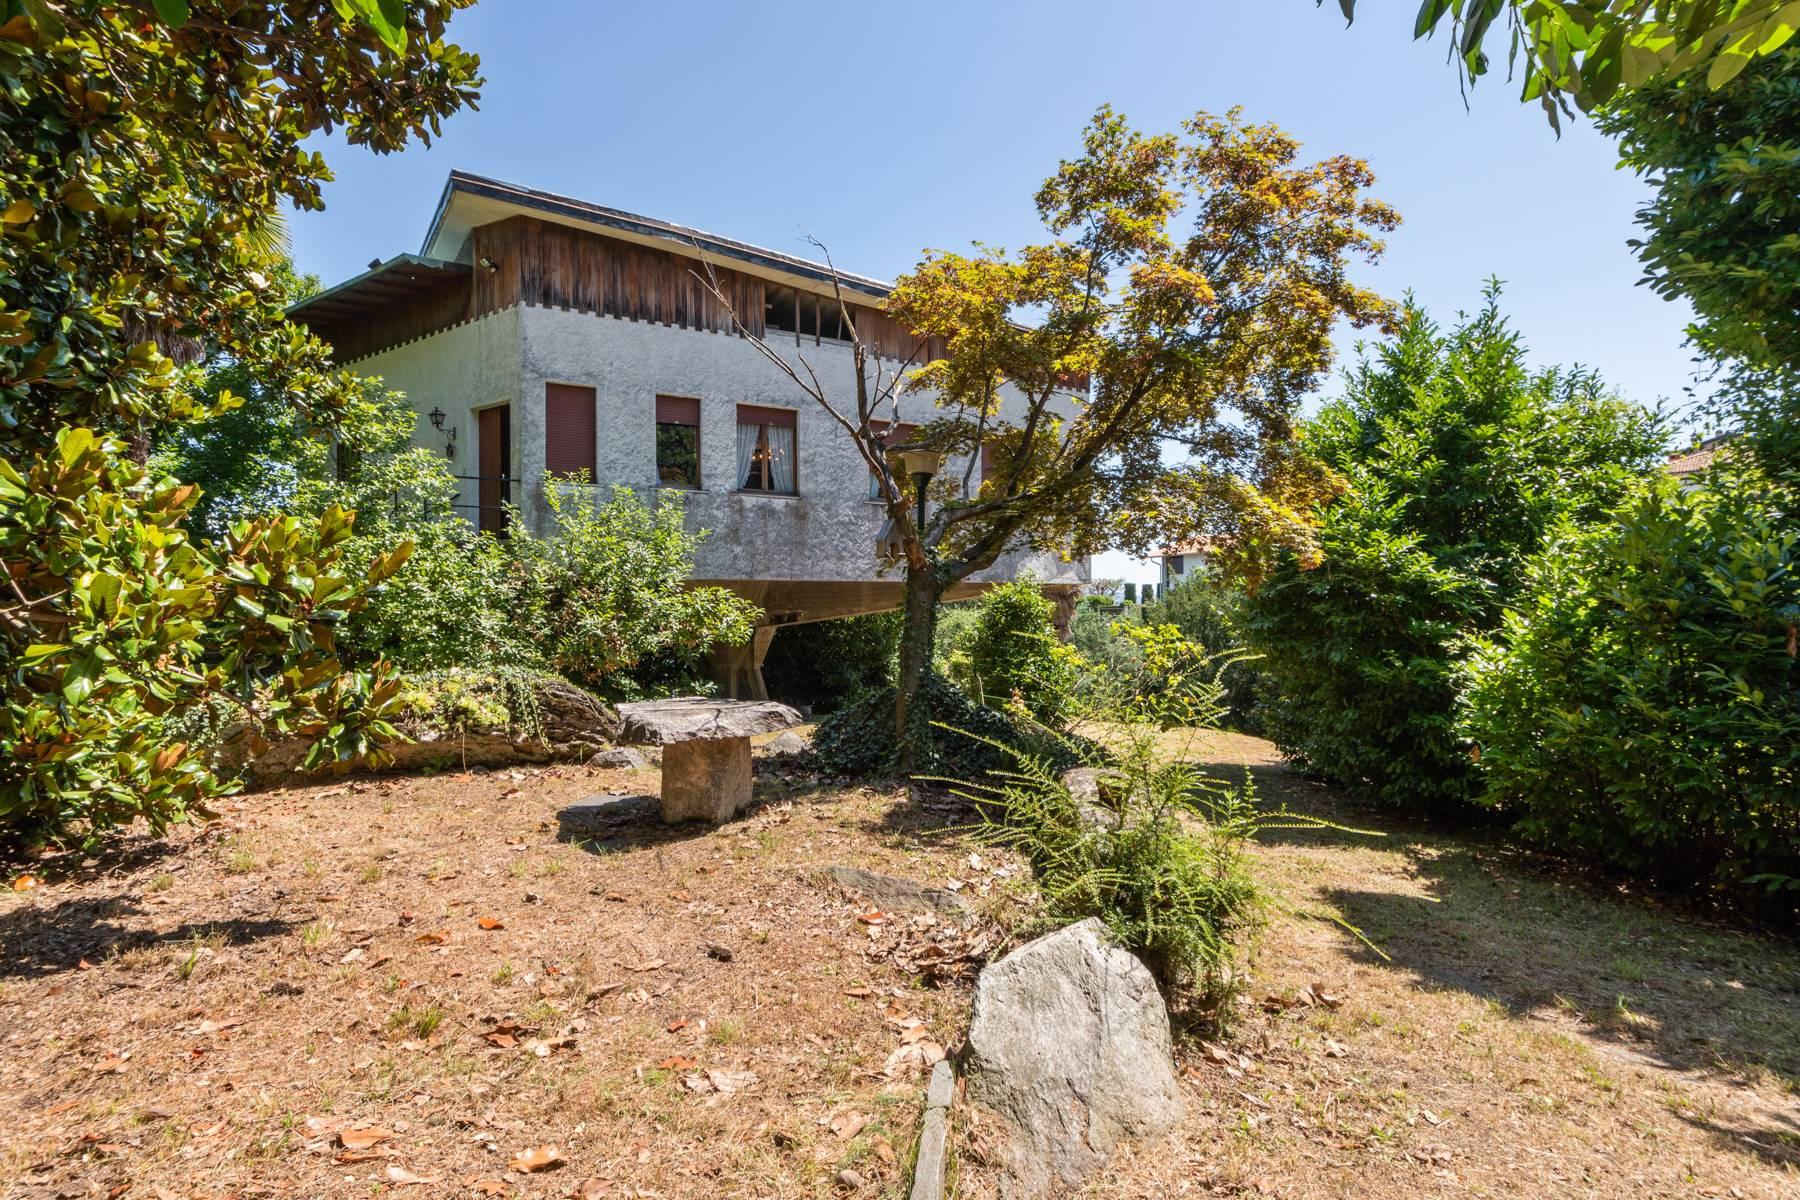 Villa in Vendita a Stresa: 5 locali, 150 mq - Foto 27